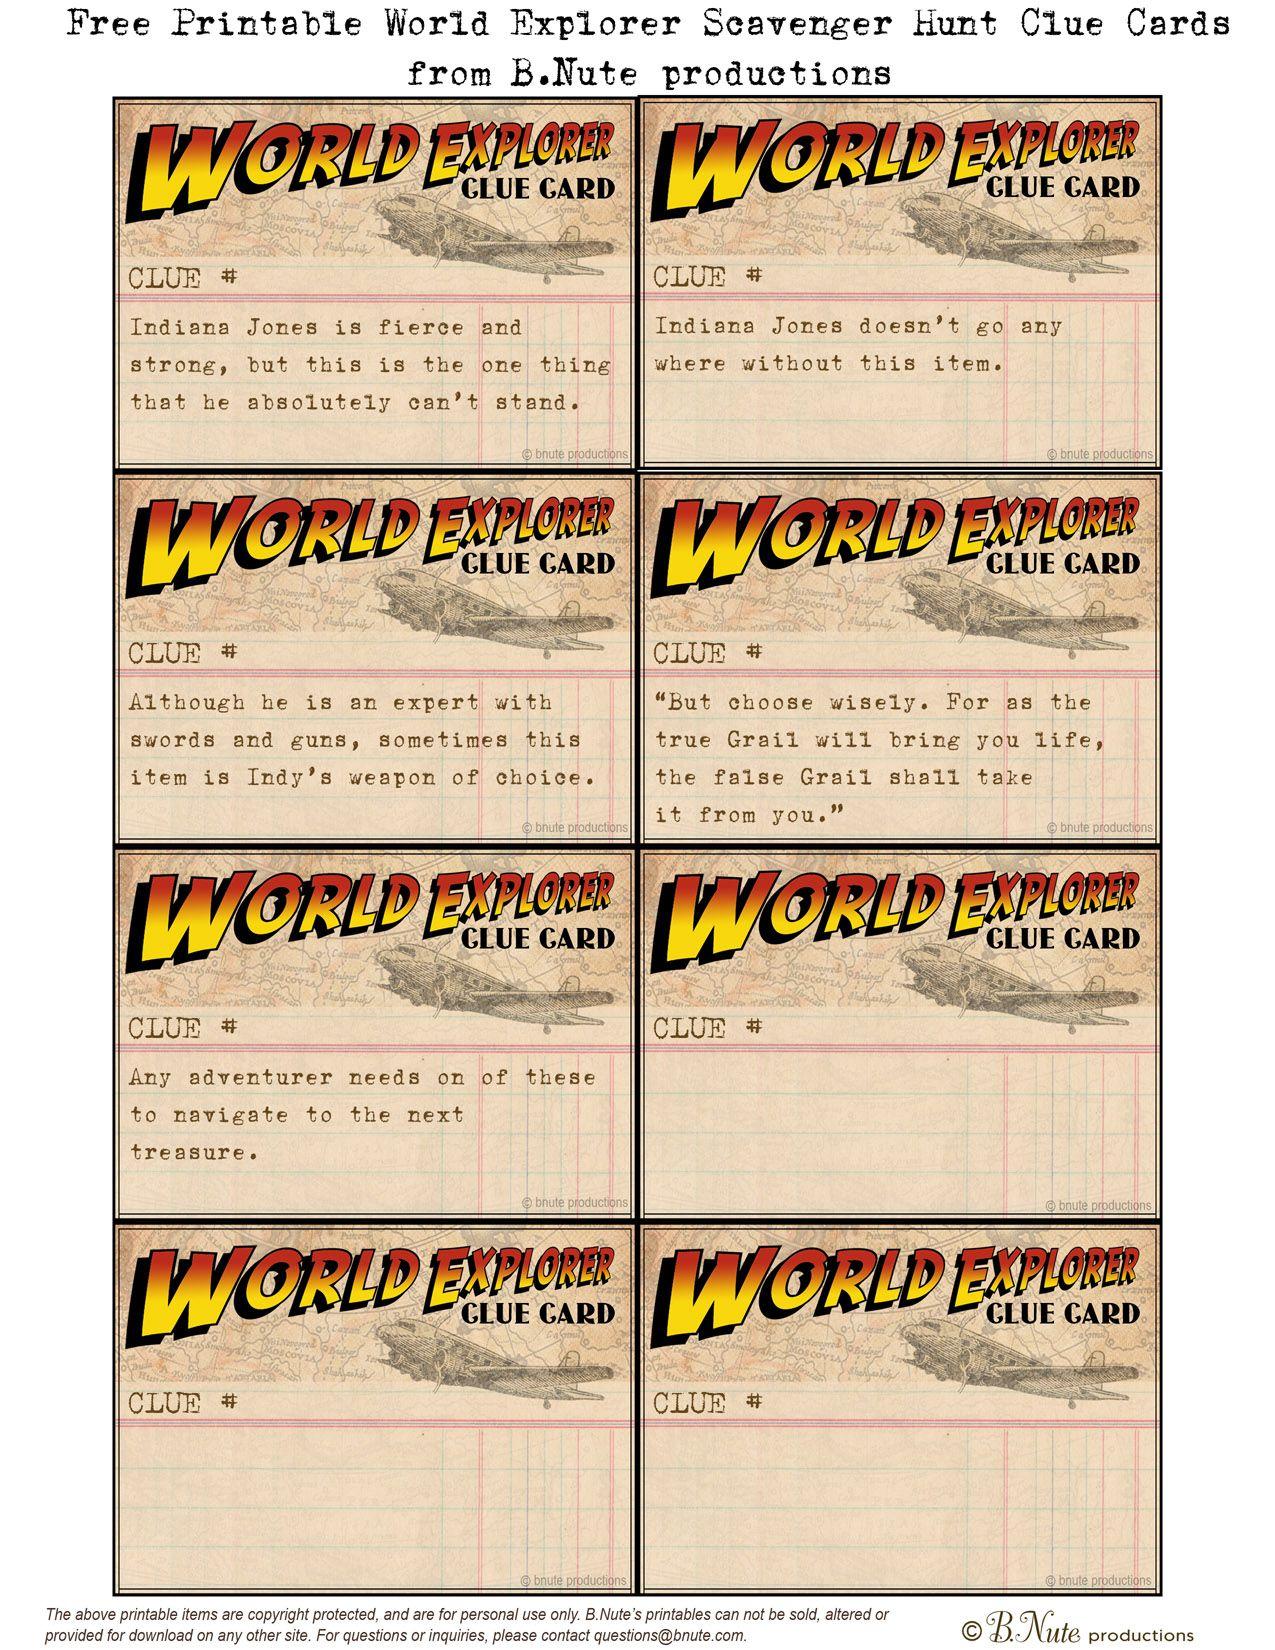 Free Printable World Explorer Indiana Jones Scavenger Hunt